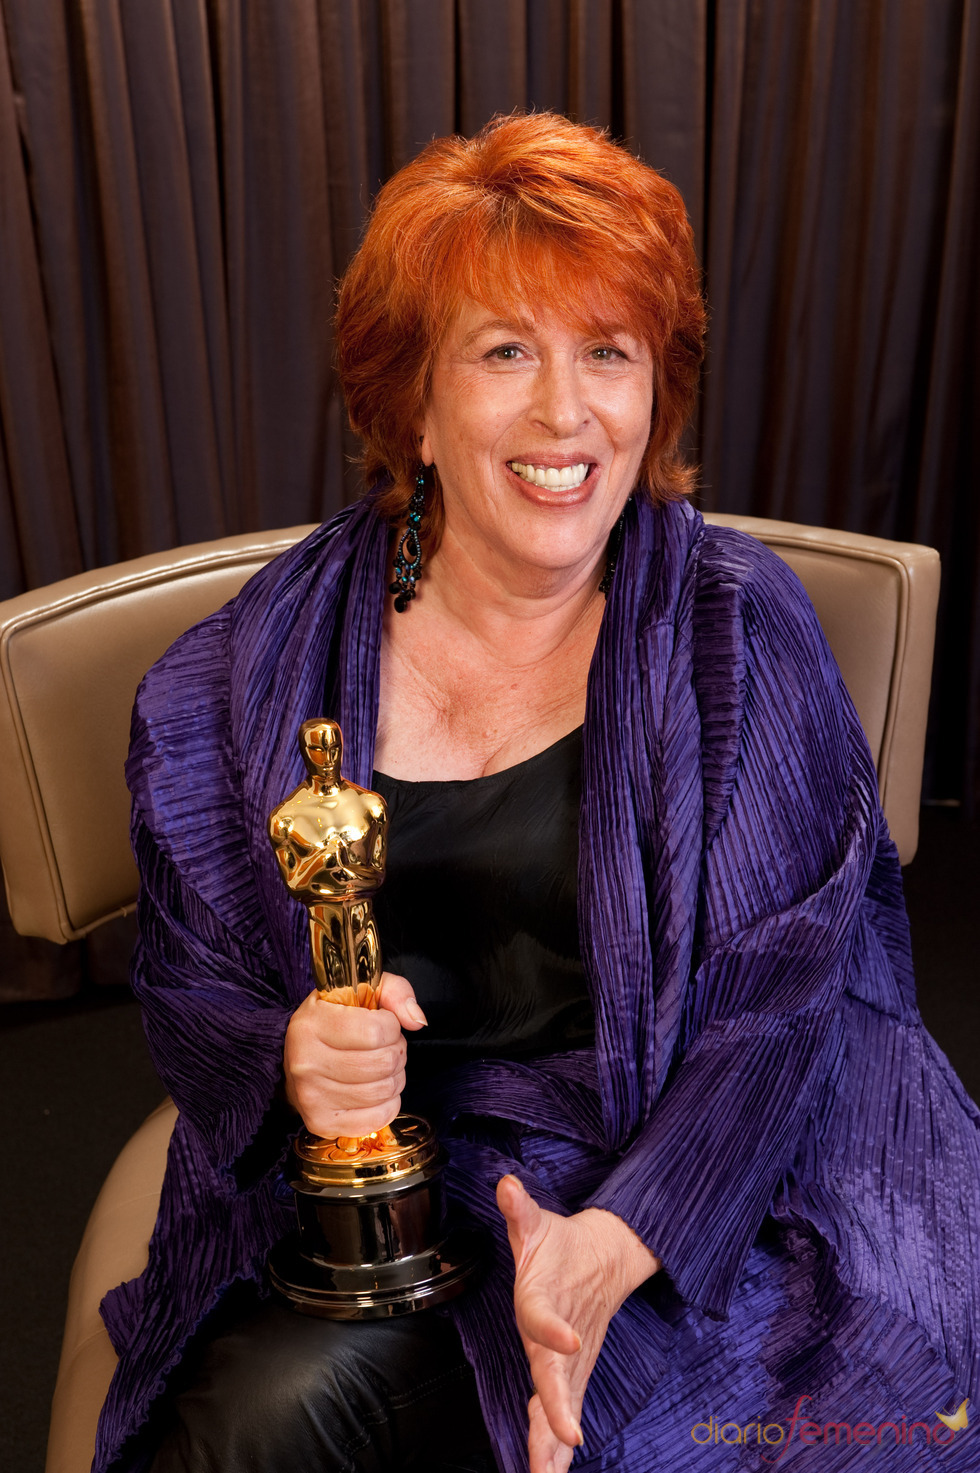 Oscar 2010 al Mejor Corto Documental